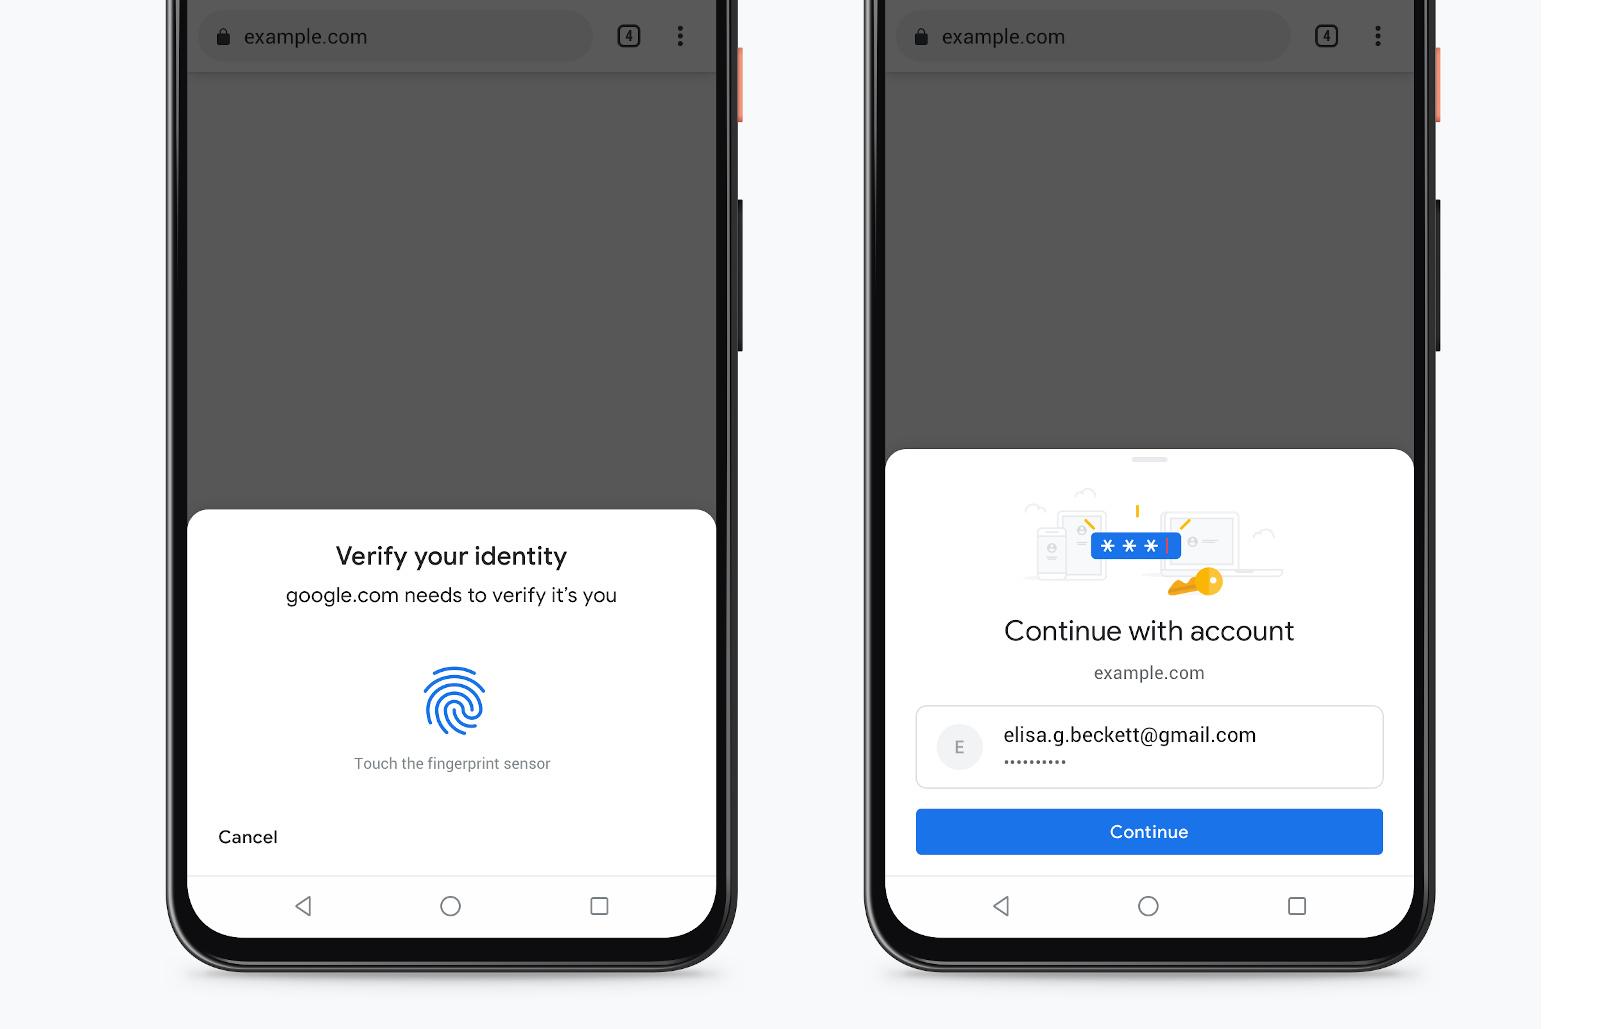 Google tightens Chrome's autofill security with biometric checks #rwanda #RwOT #yks2020